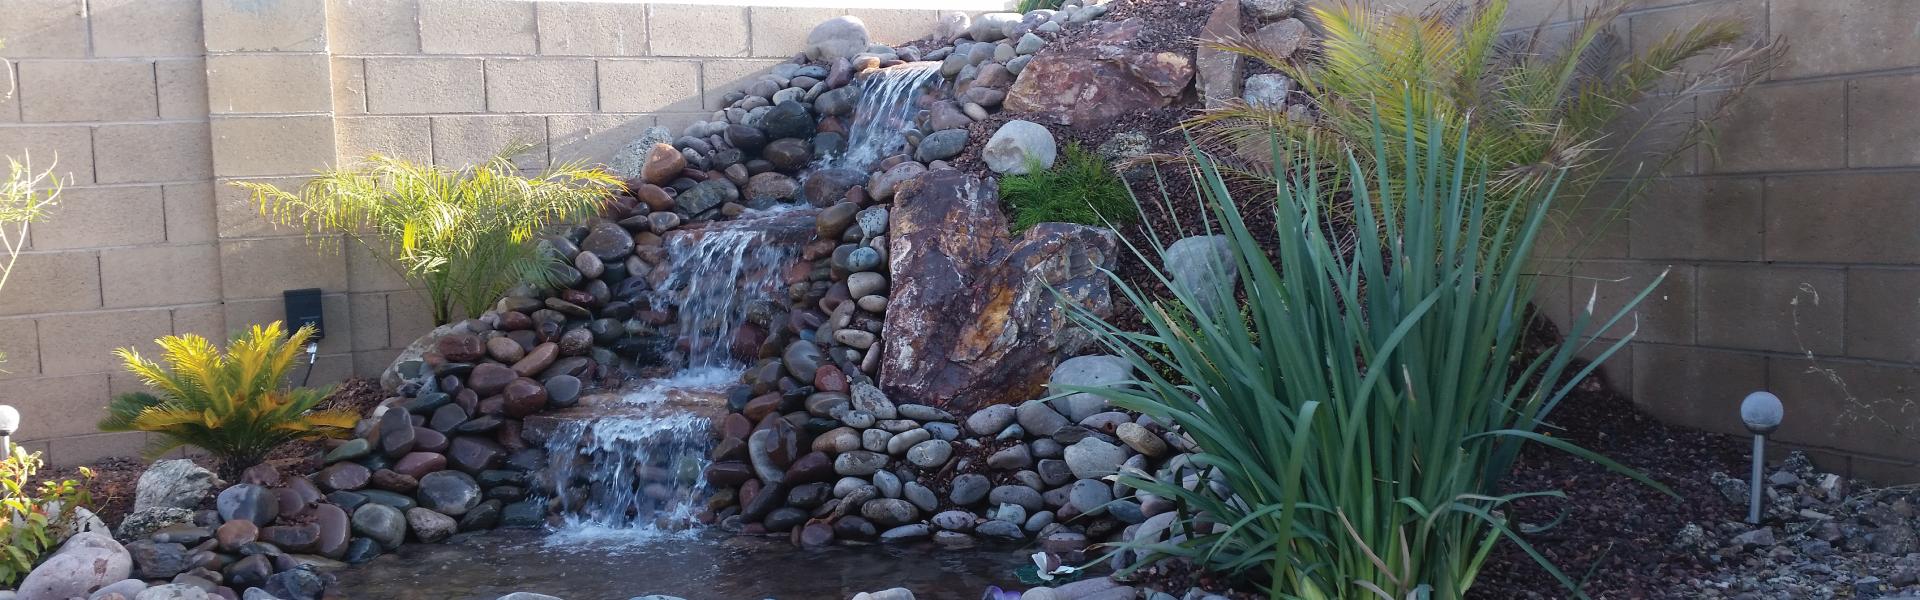 WaterFeature01